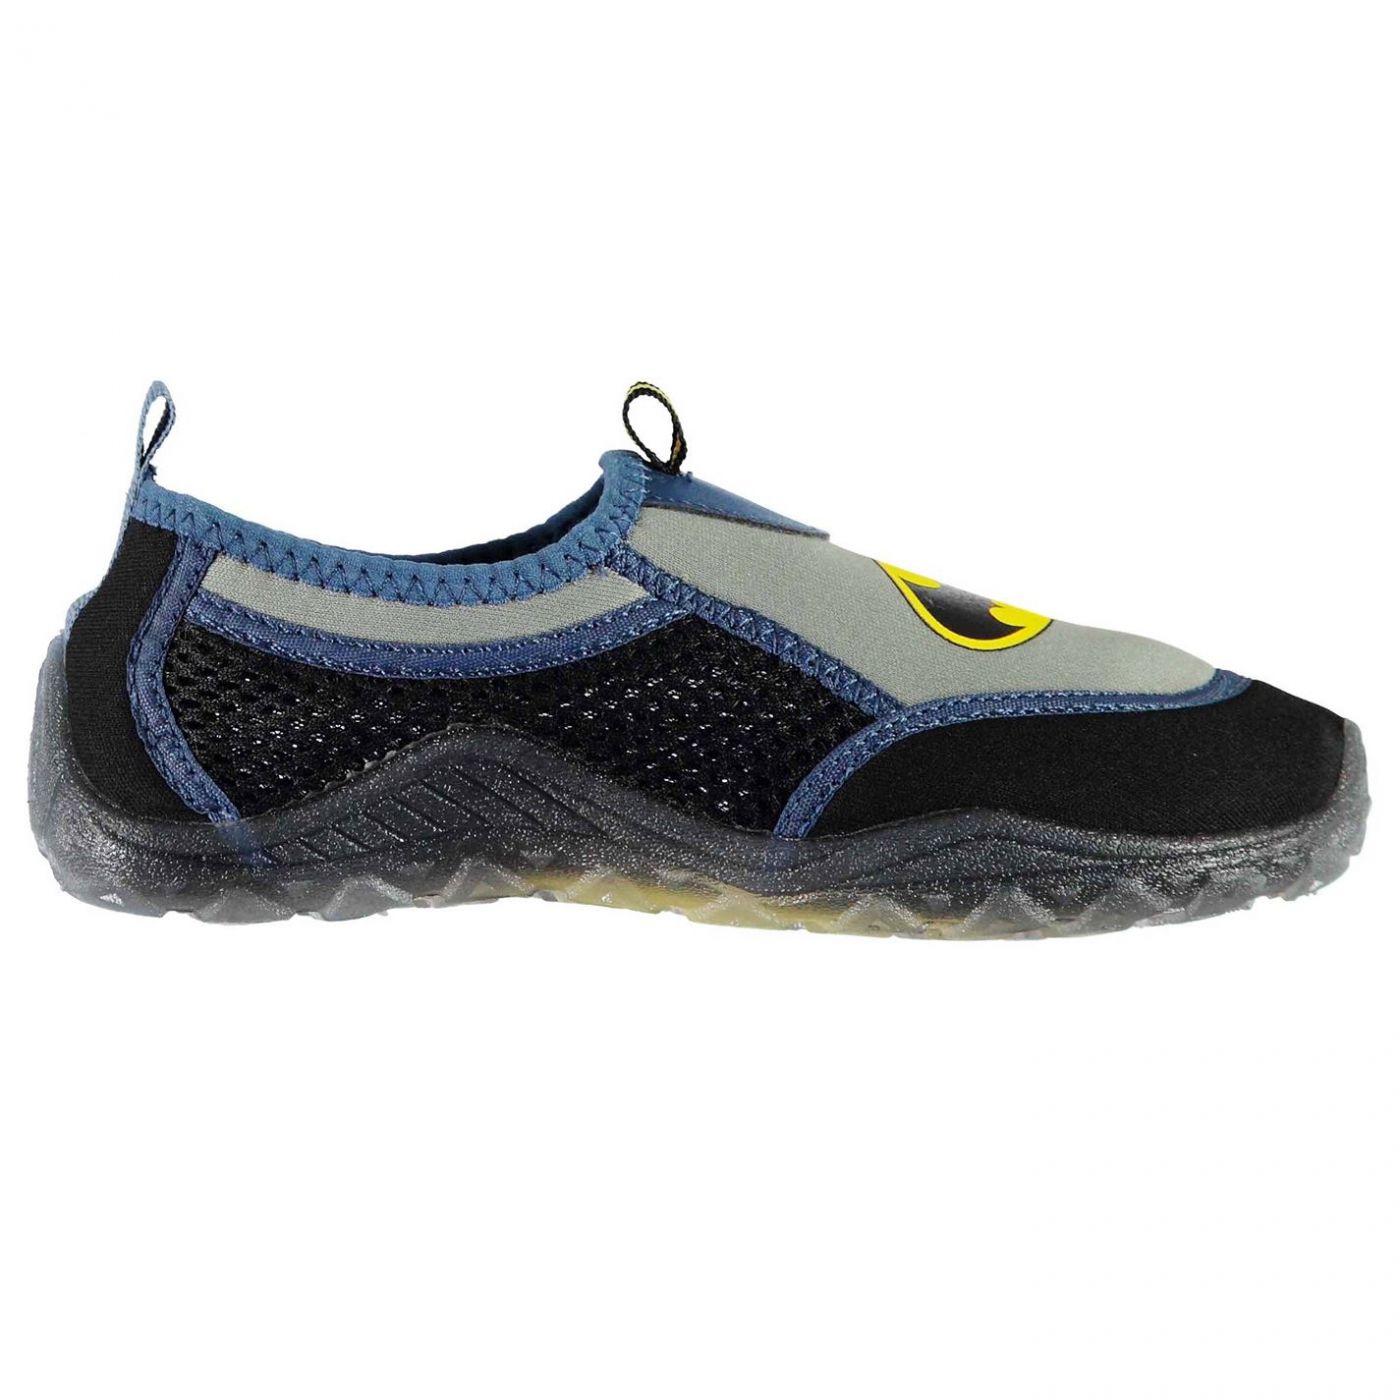 Character Childrens Aqua Water Shoes